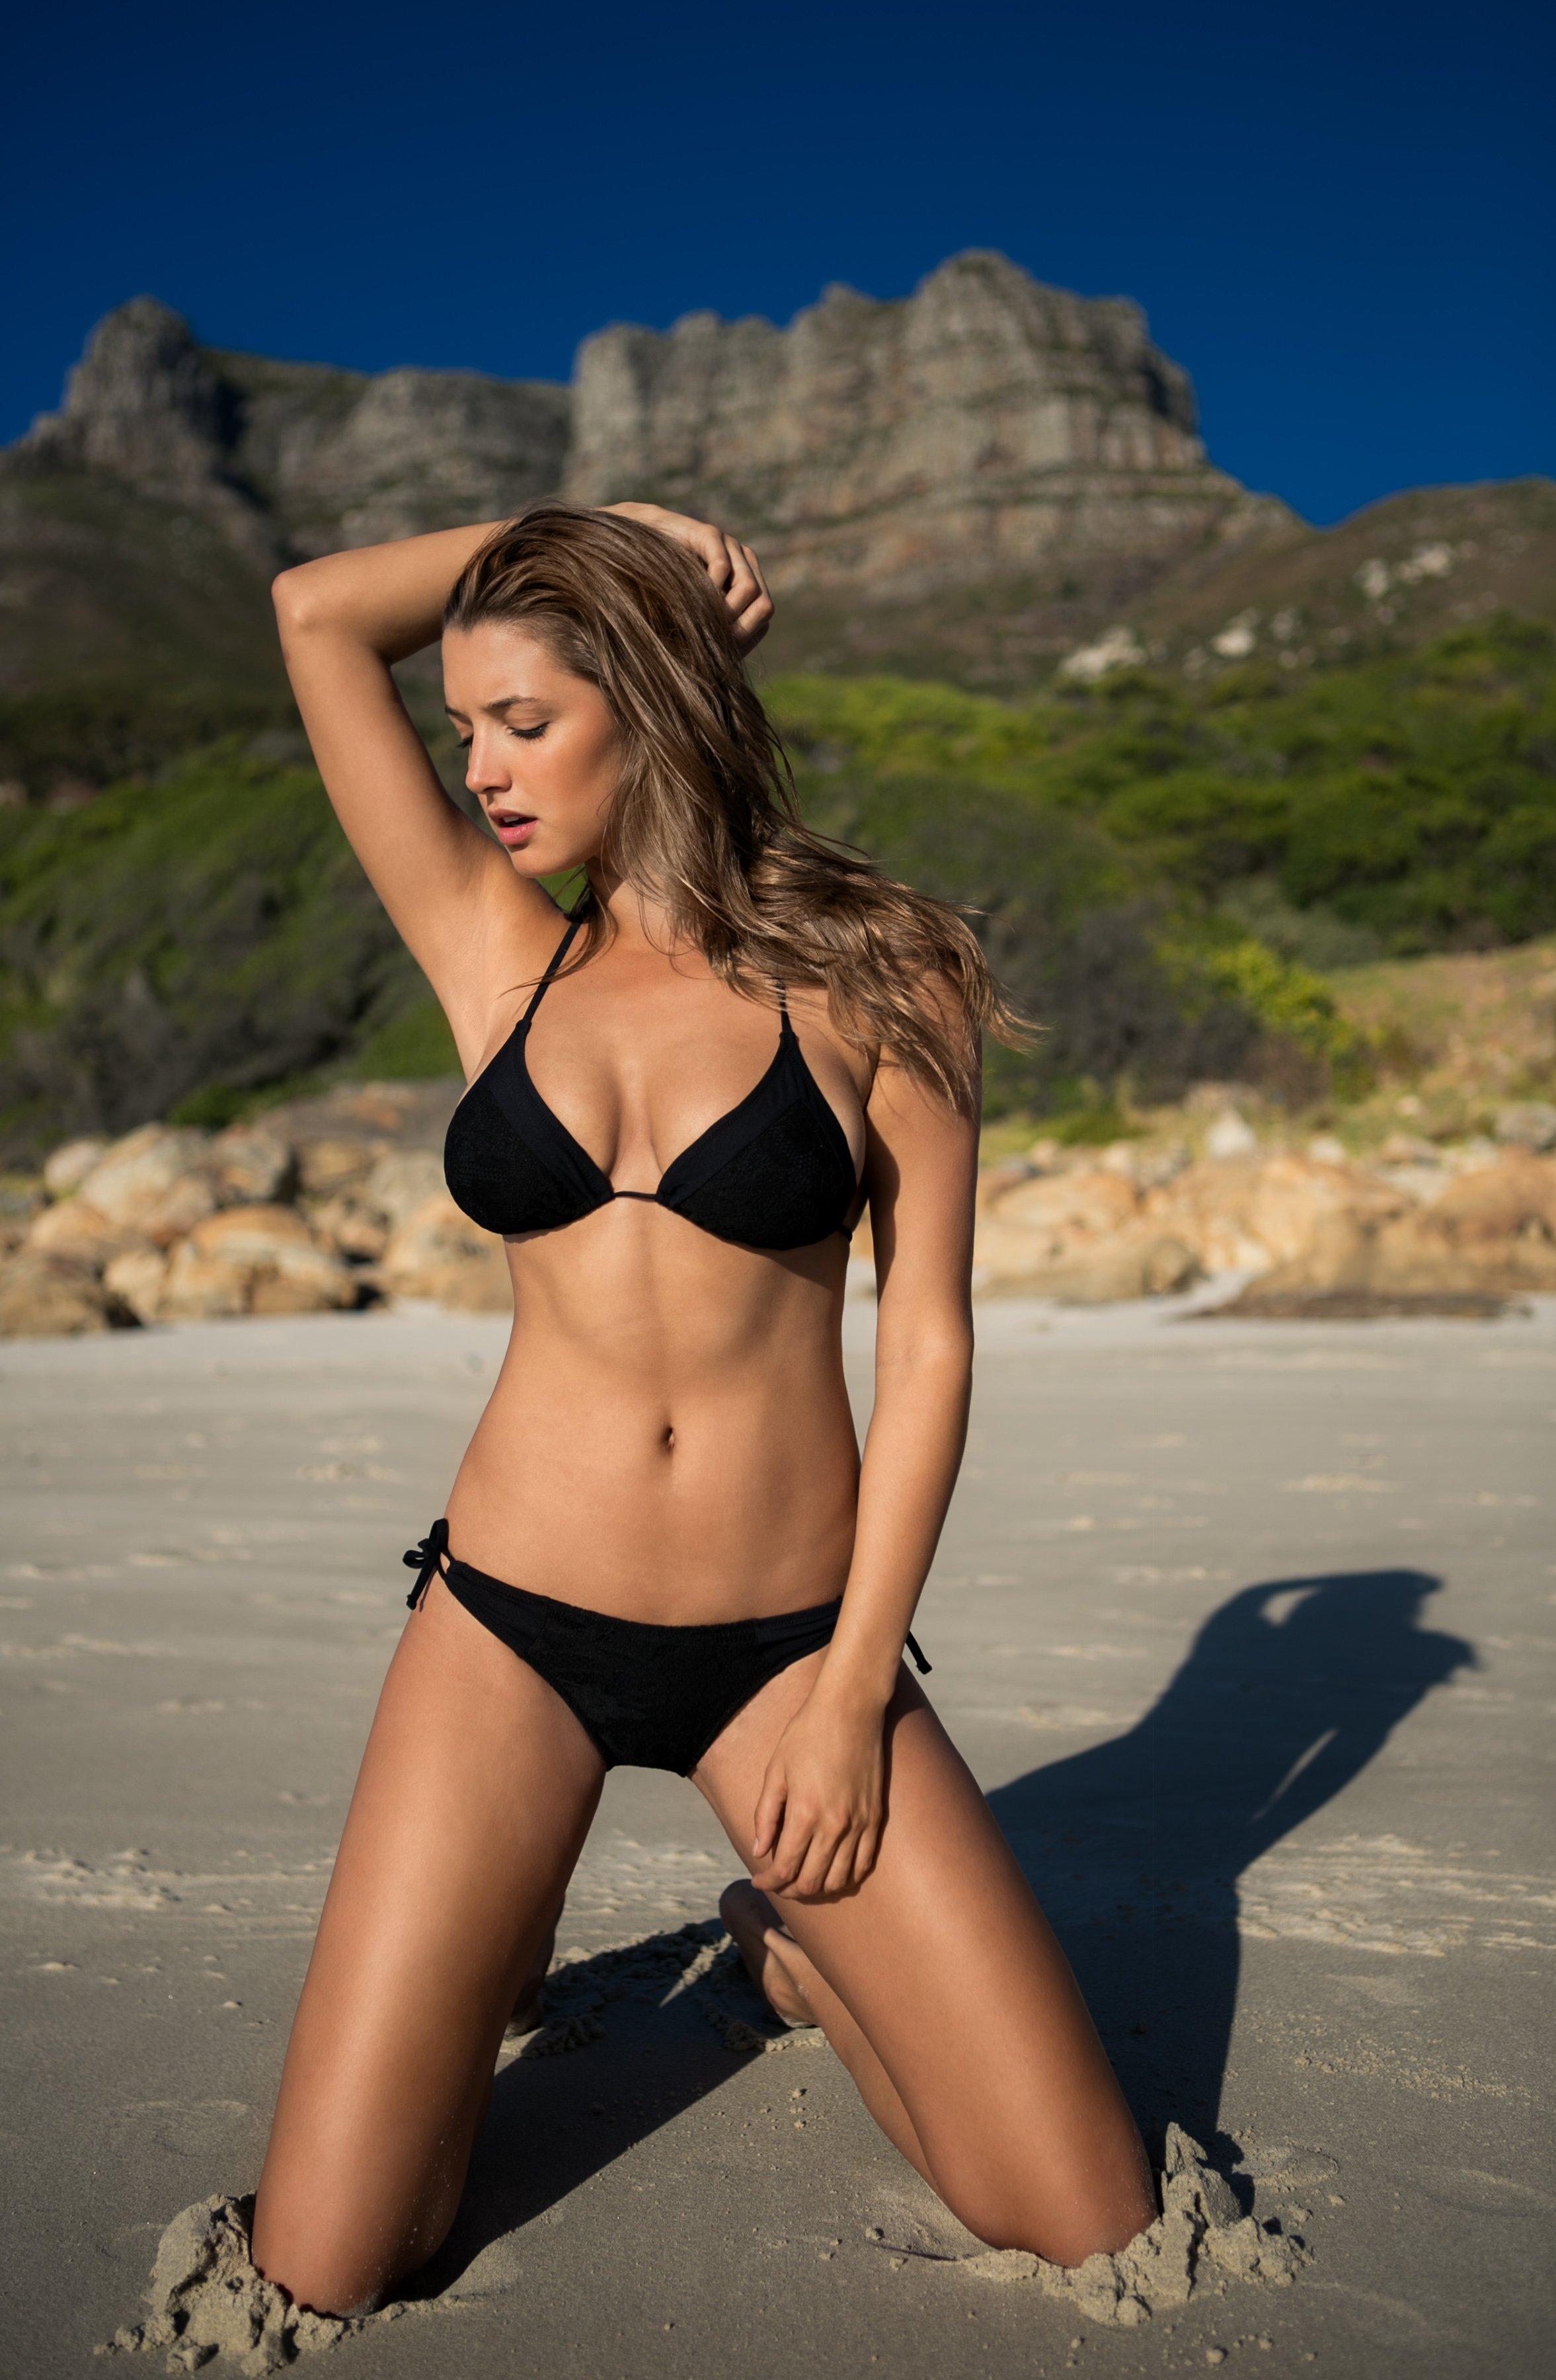 Alyssa Arce pose